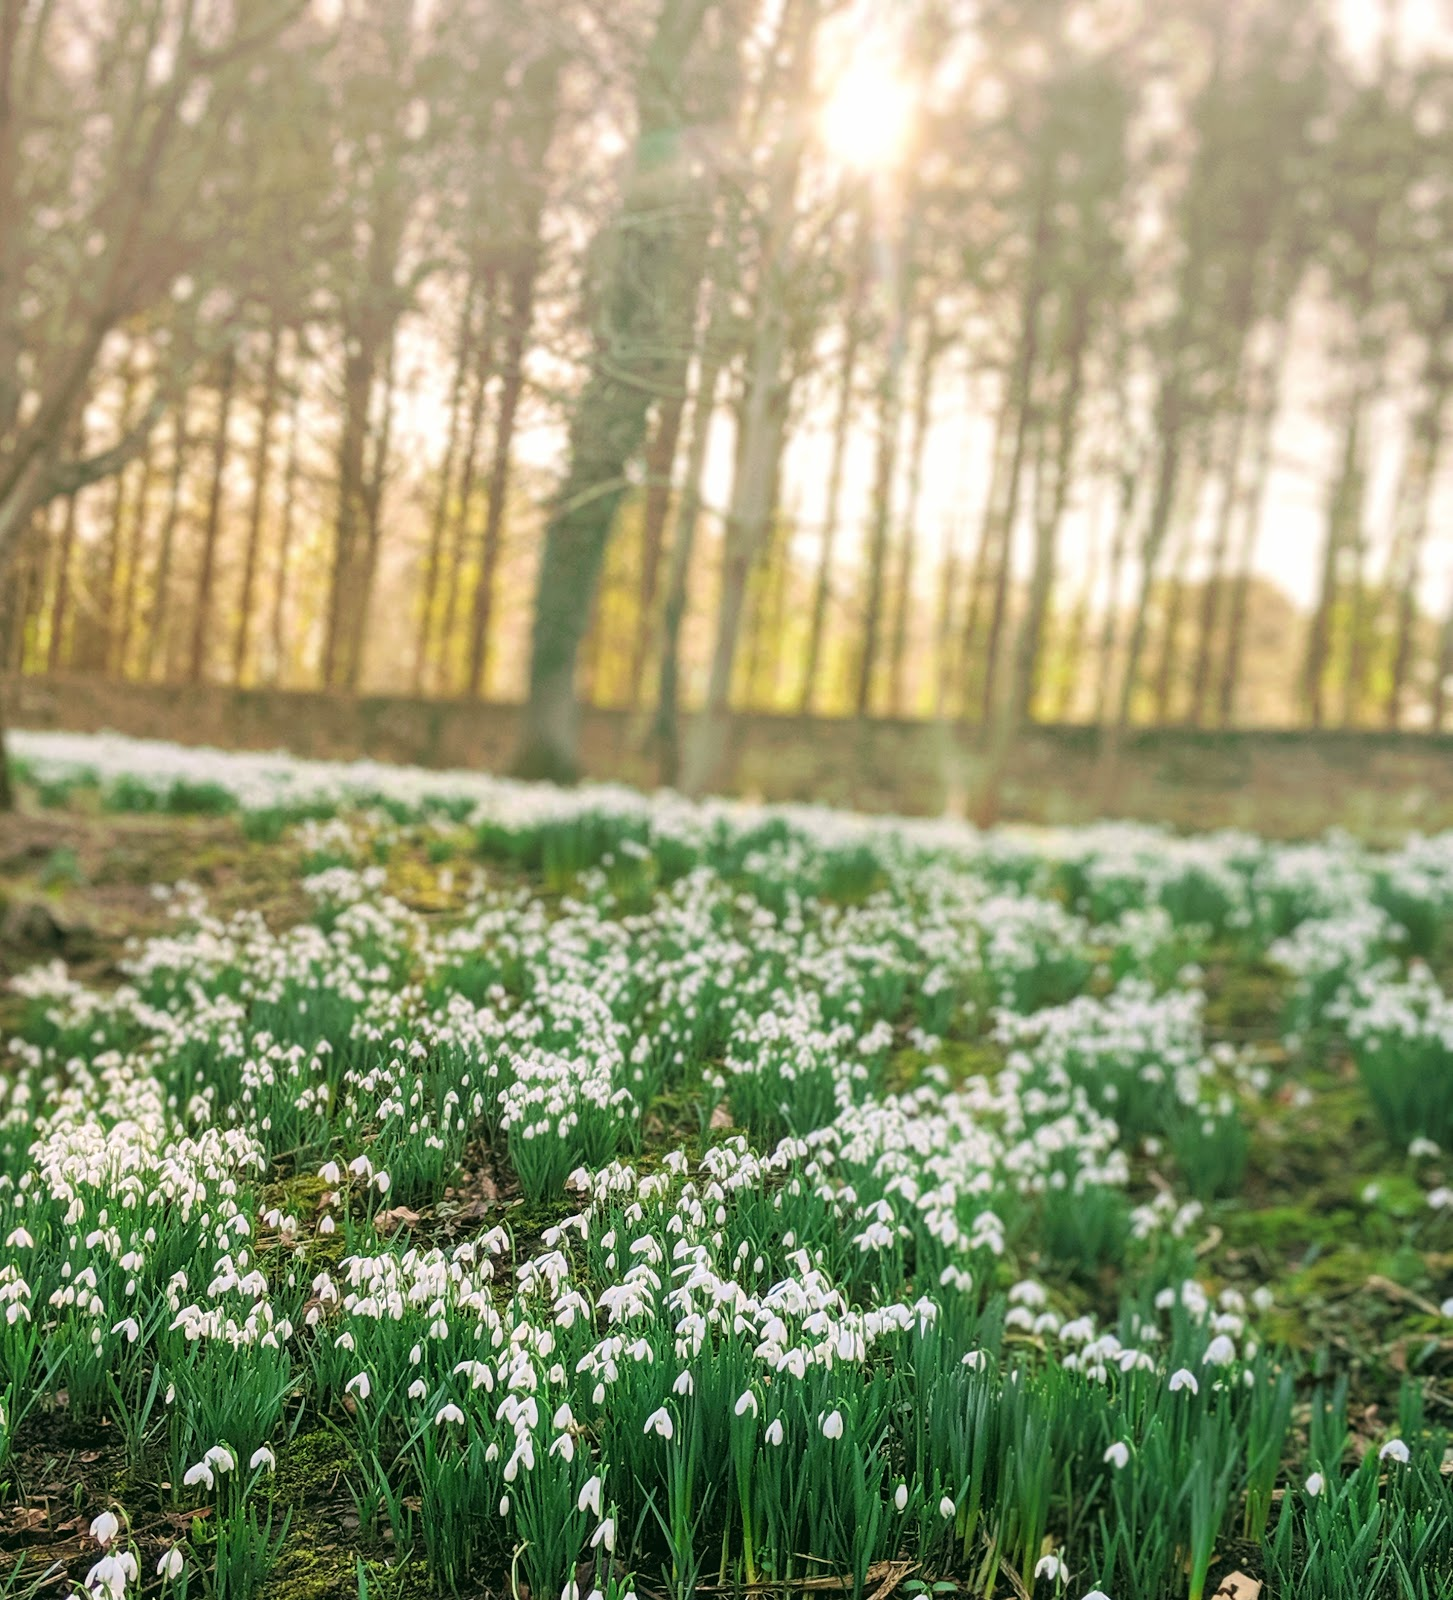 Howick Hall Snowdrop Walk & Sensory Garden - snowdrops